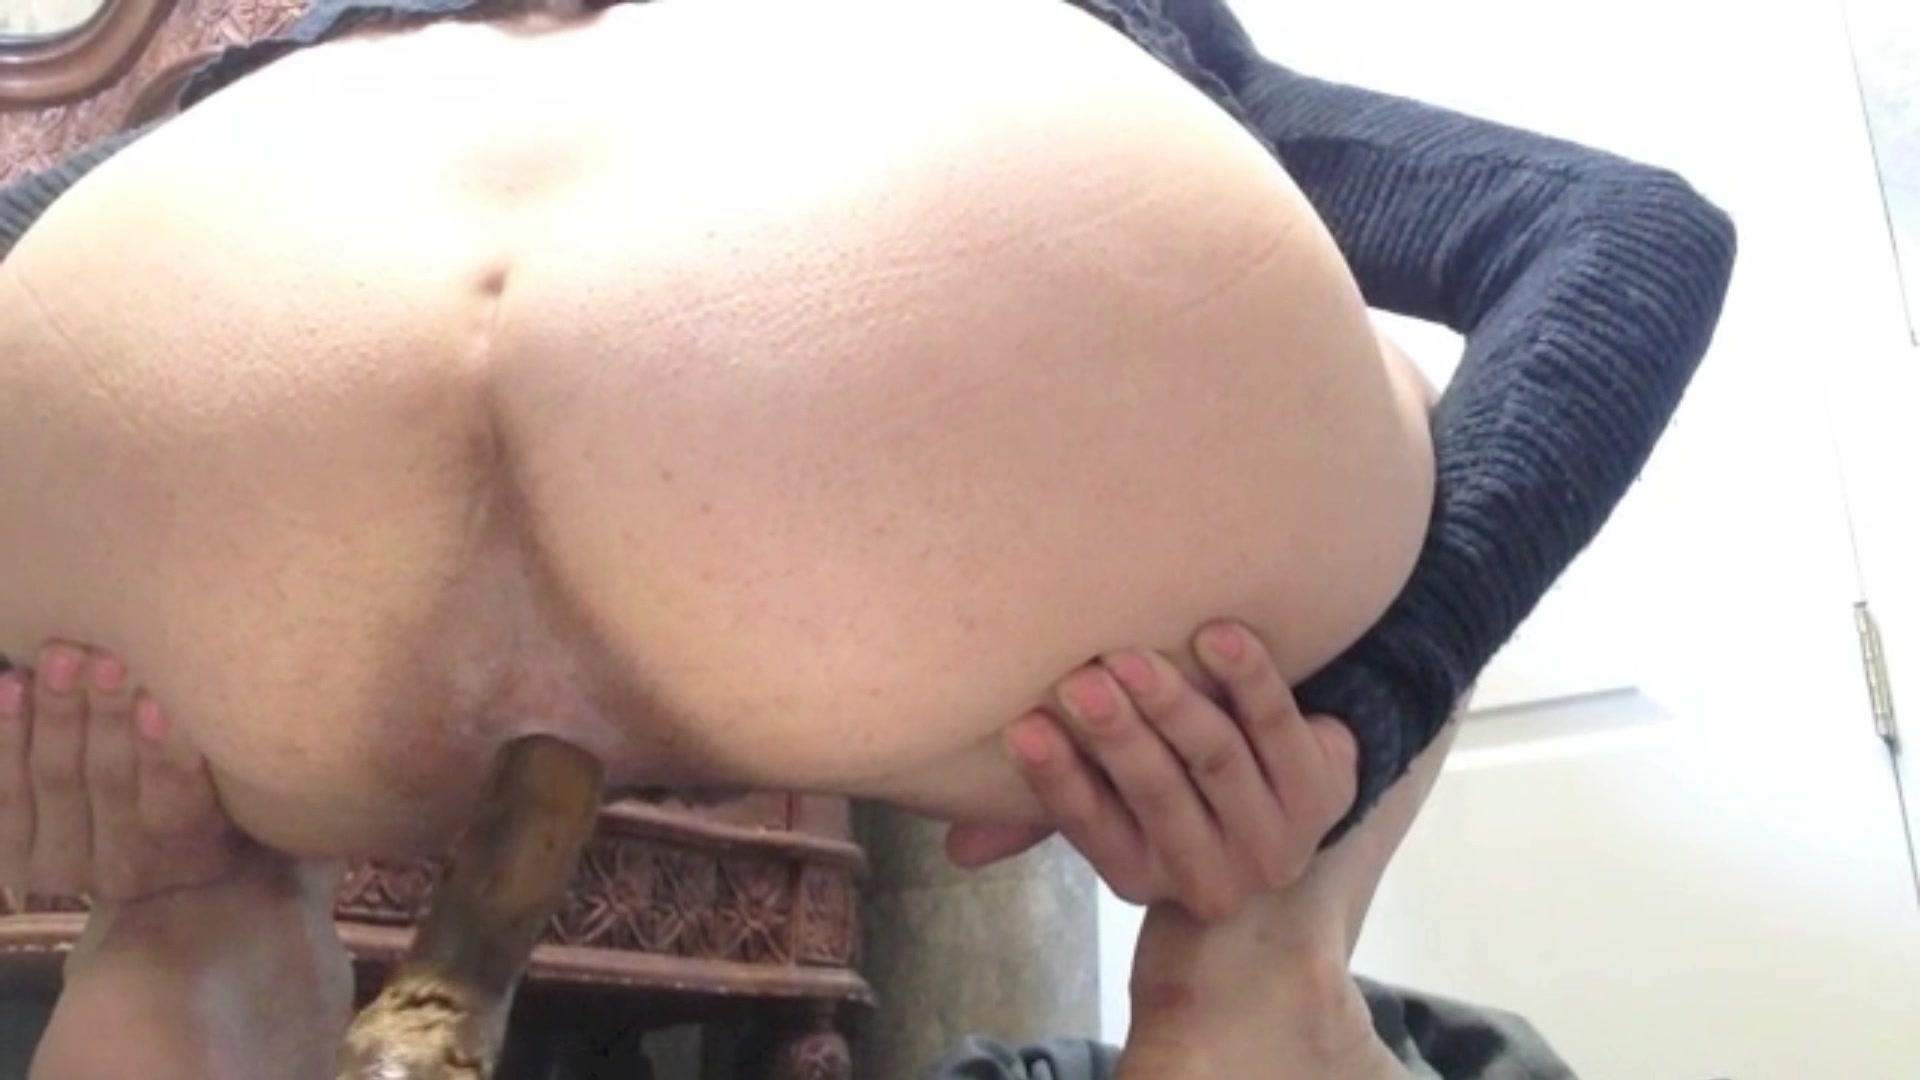 Cute girl pooping - video 2 - ThisVid.com